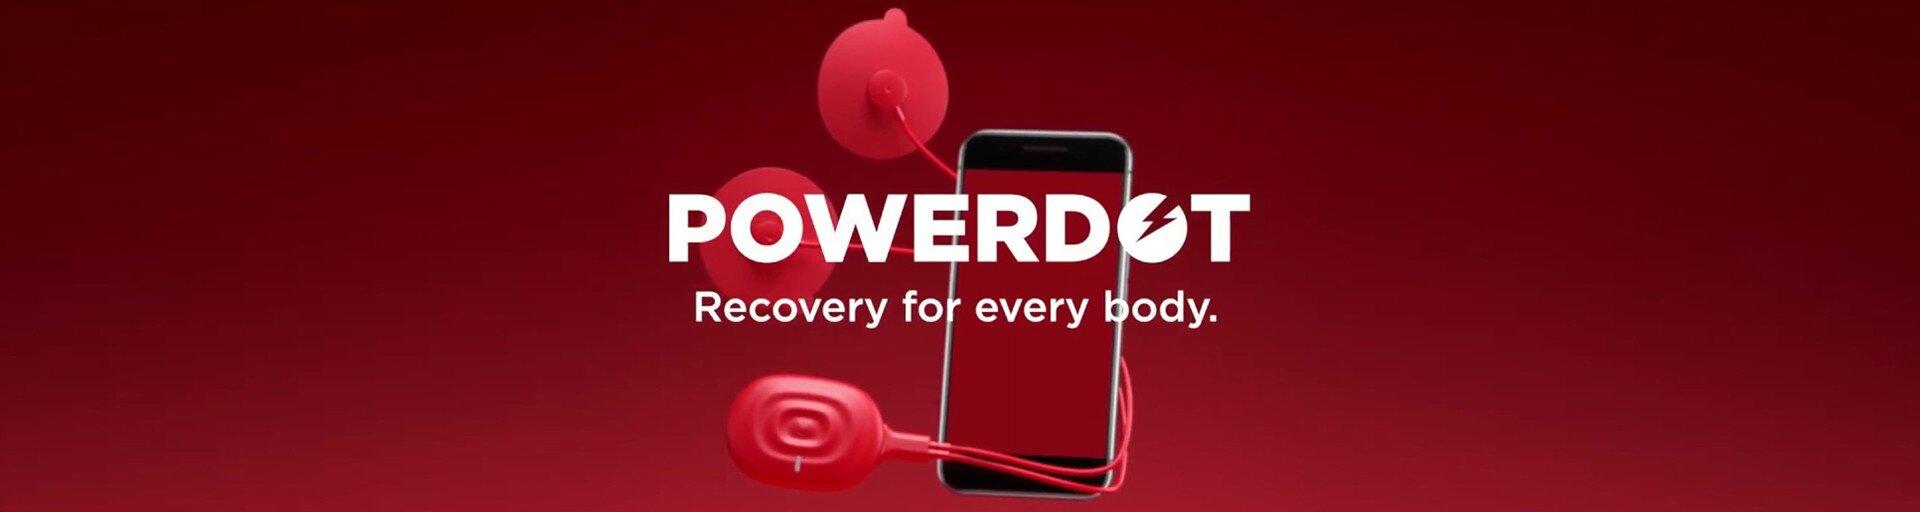 PowerDot